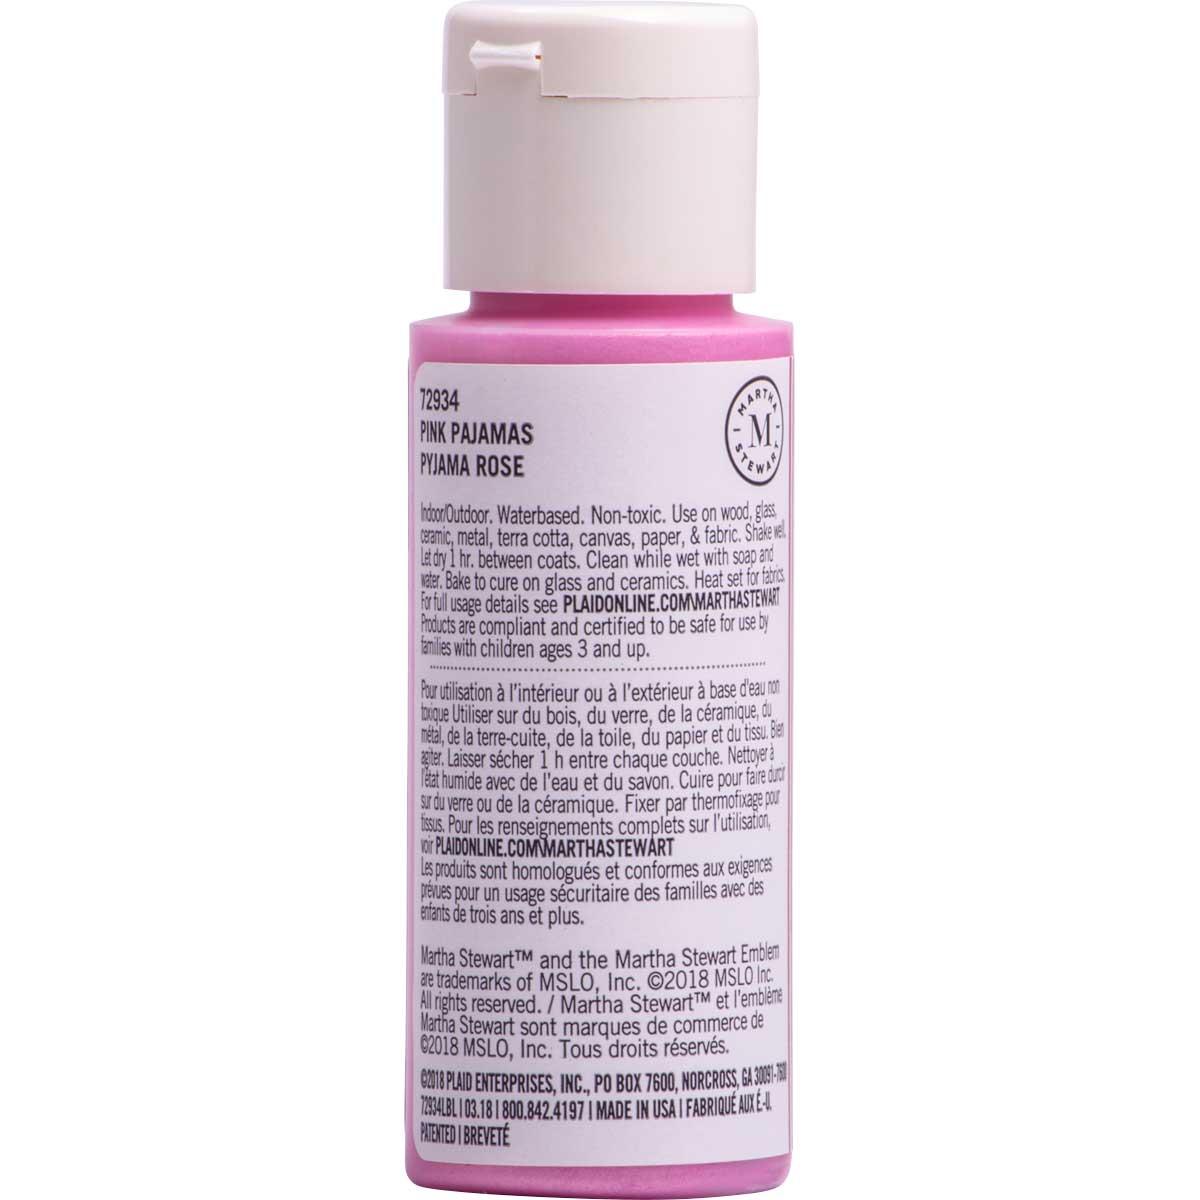 Martha Stewart ® Multi-Surface Pearl Acrylic Craft Paint CPSIA - Pink Pajamas, 2 oz. - 72934